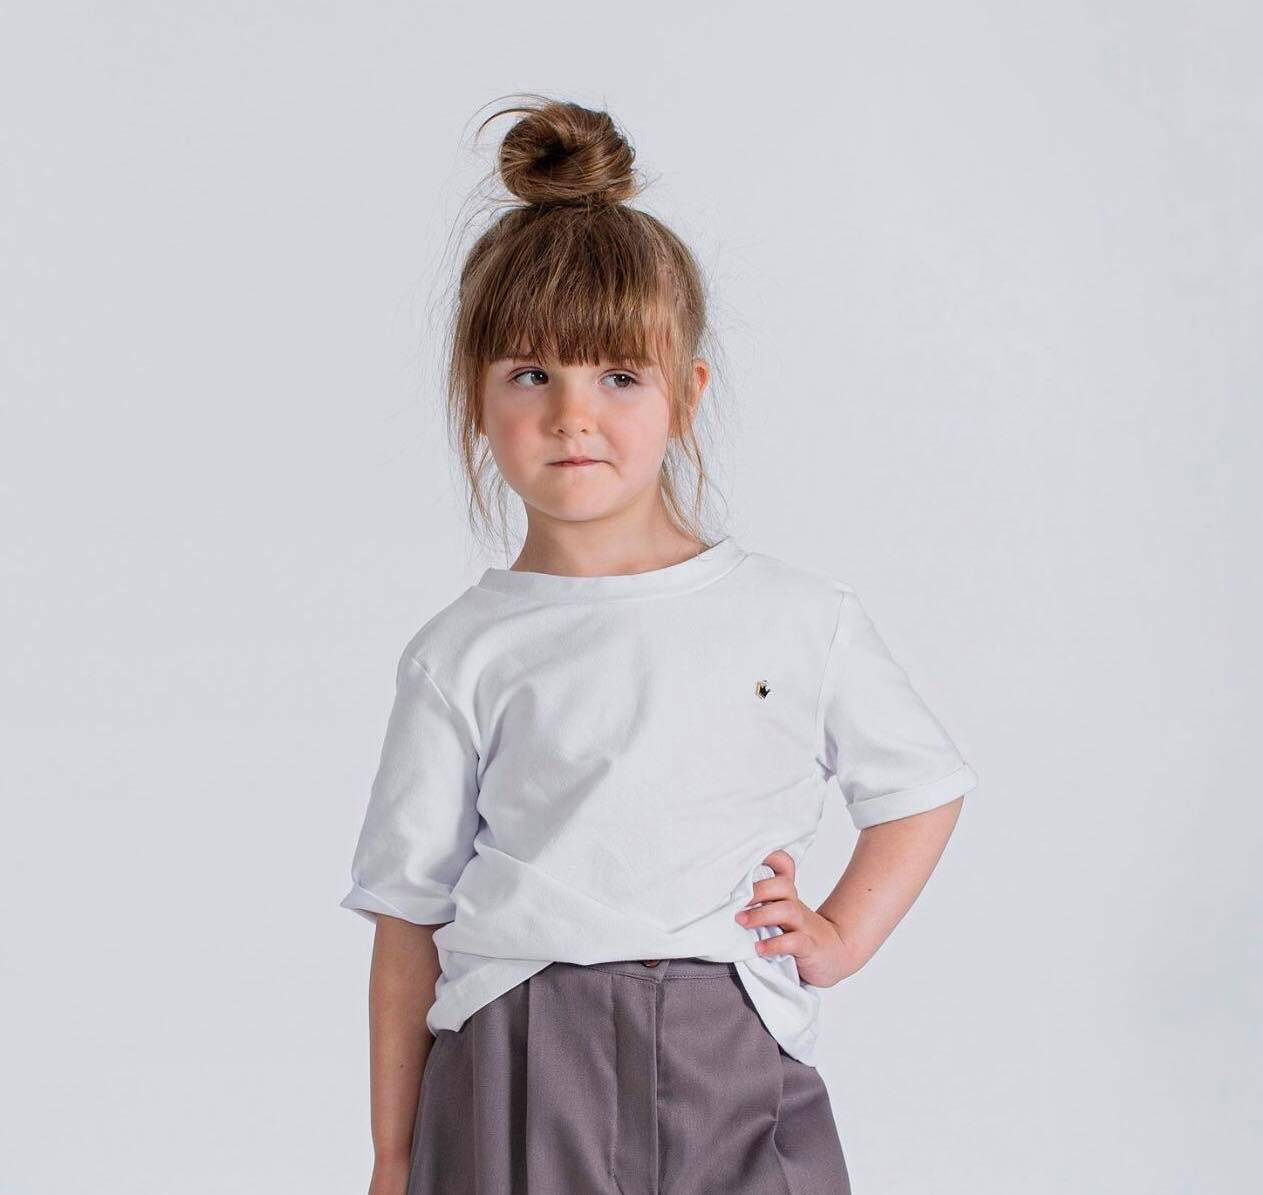 Biały t-shirt - Domino.little.dress